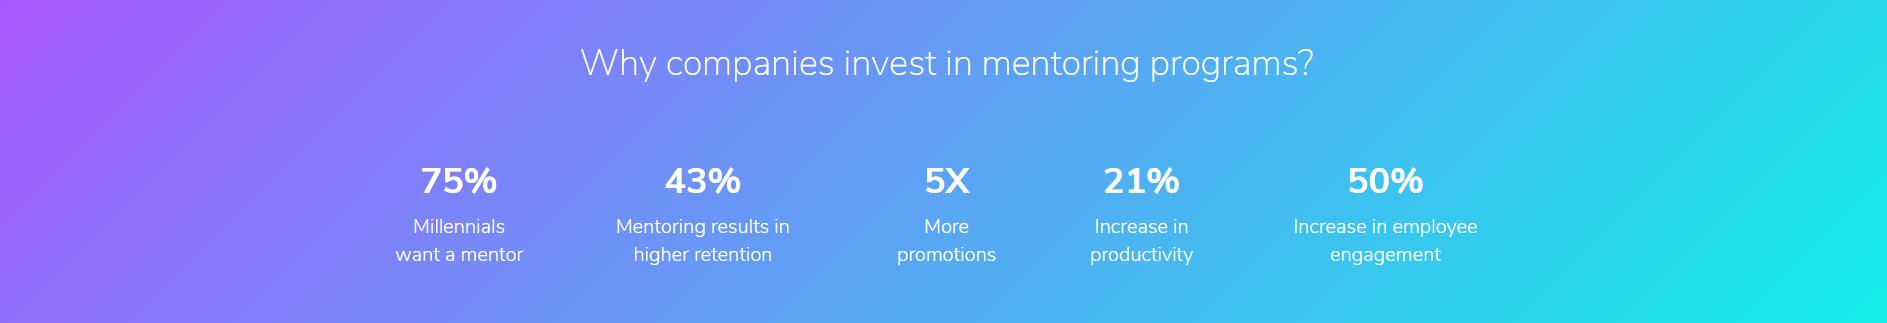 company mentoring program-3